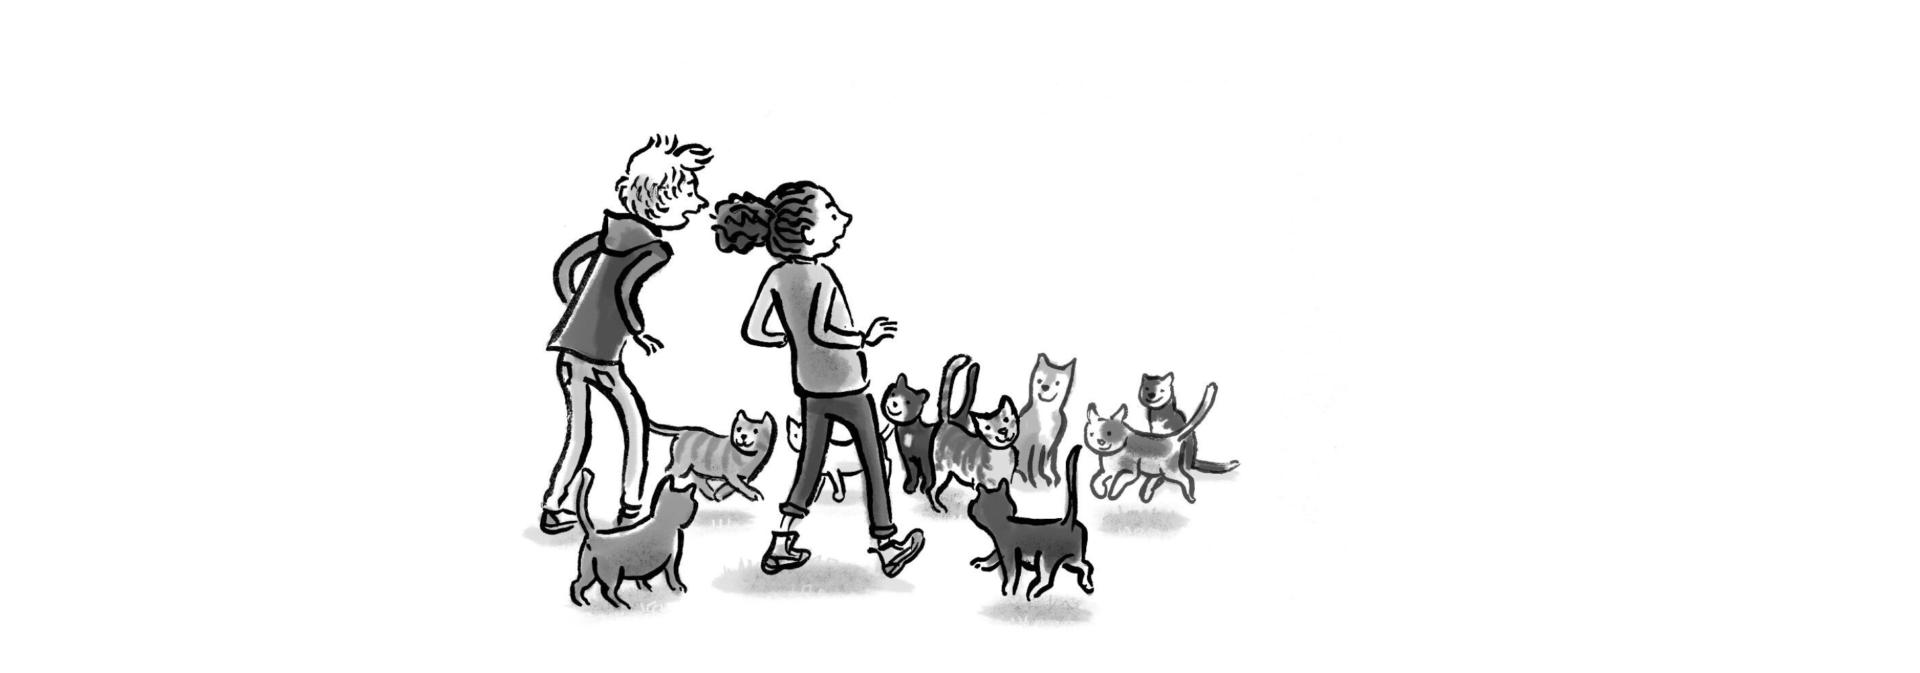 Het geheim van de dierenredders - Annet Jacobs